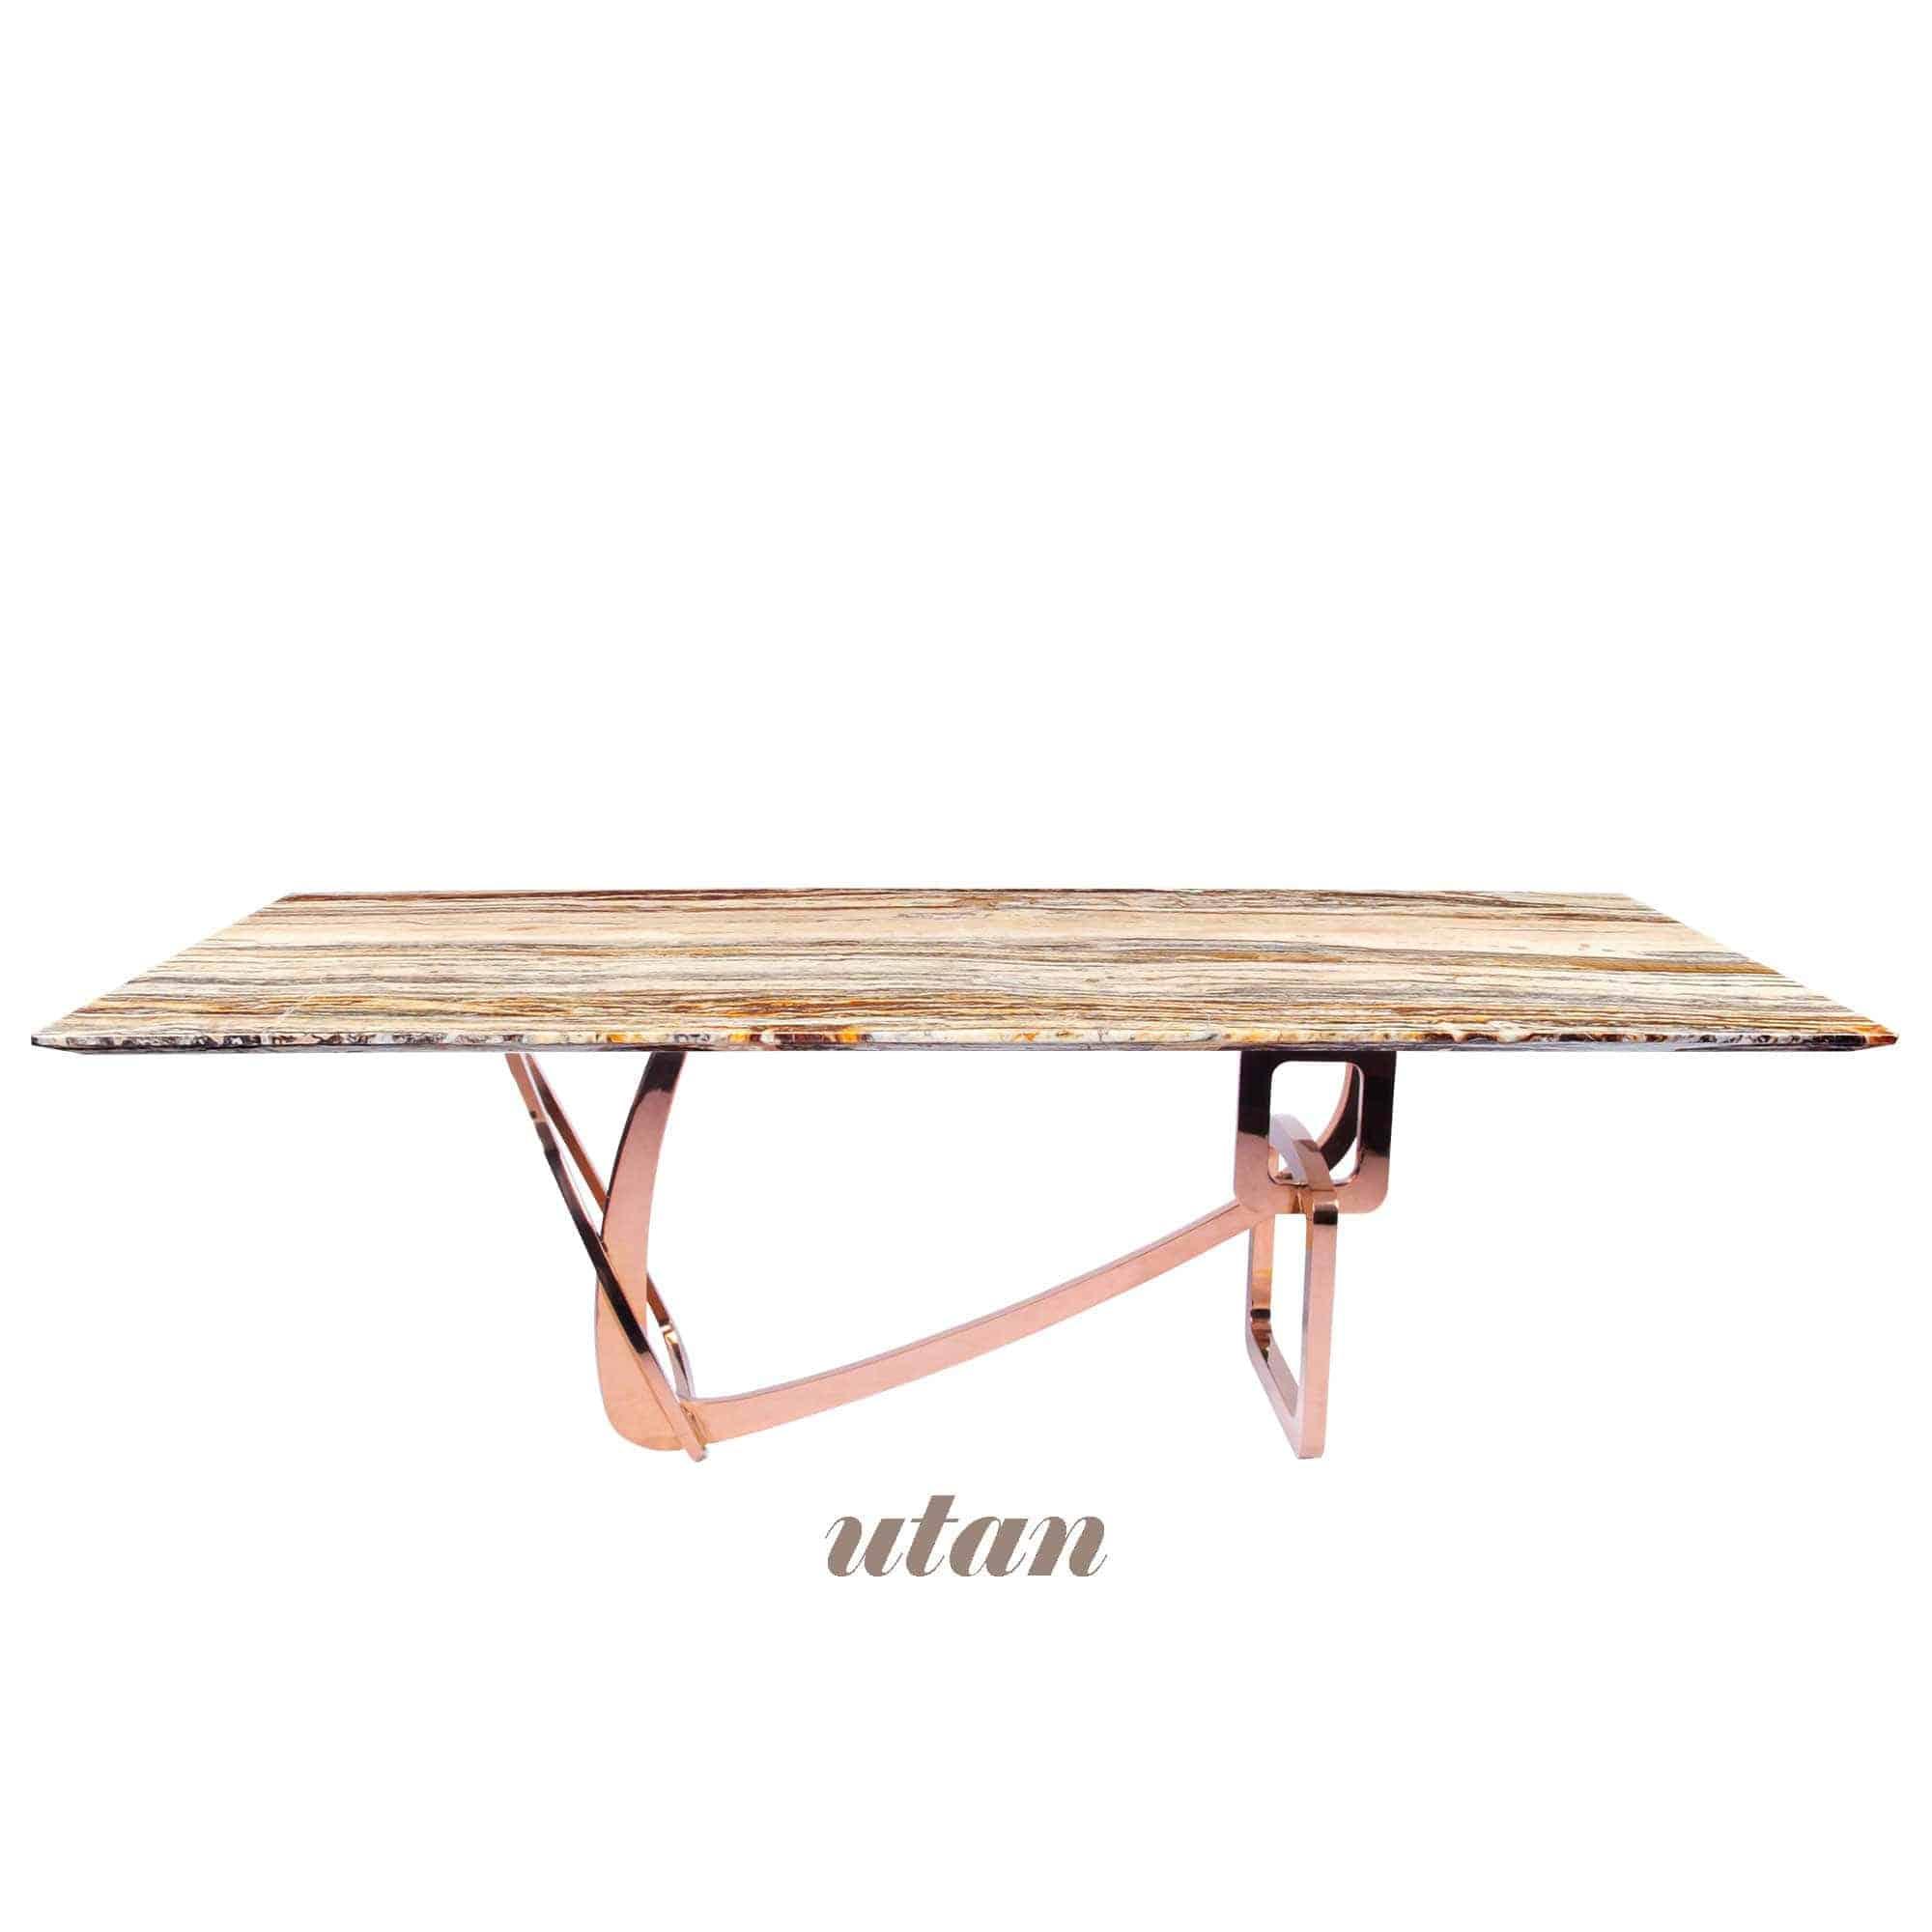 arcabados-beige-rectangular-marble-dining-table-8-to-10-pax-decasa-marble-2400x1100mm-utan-rg